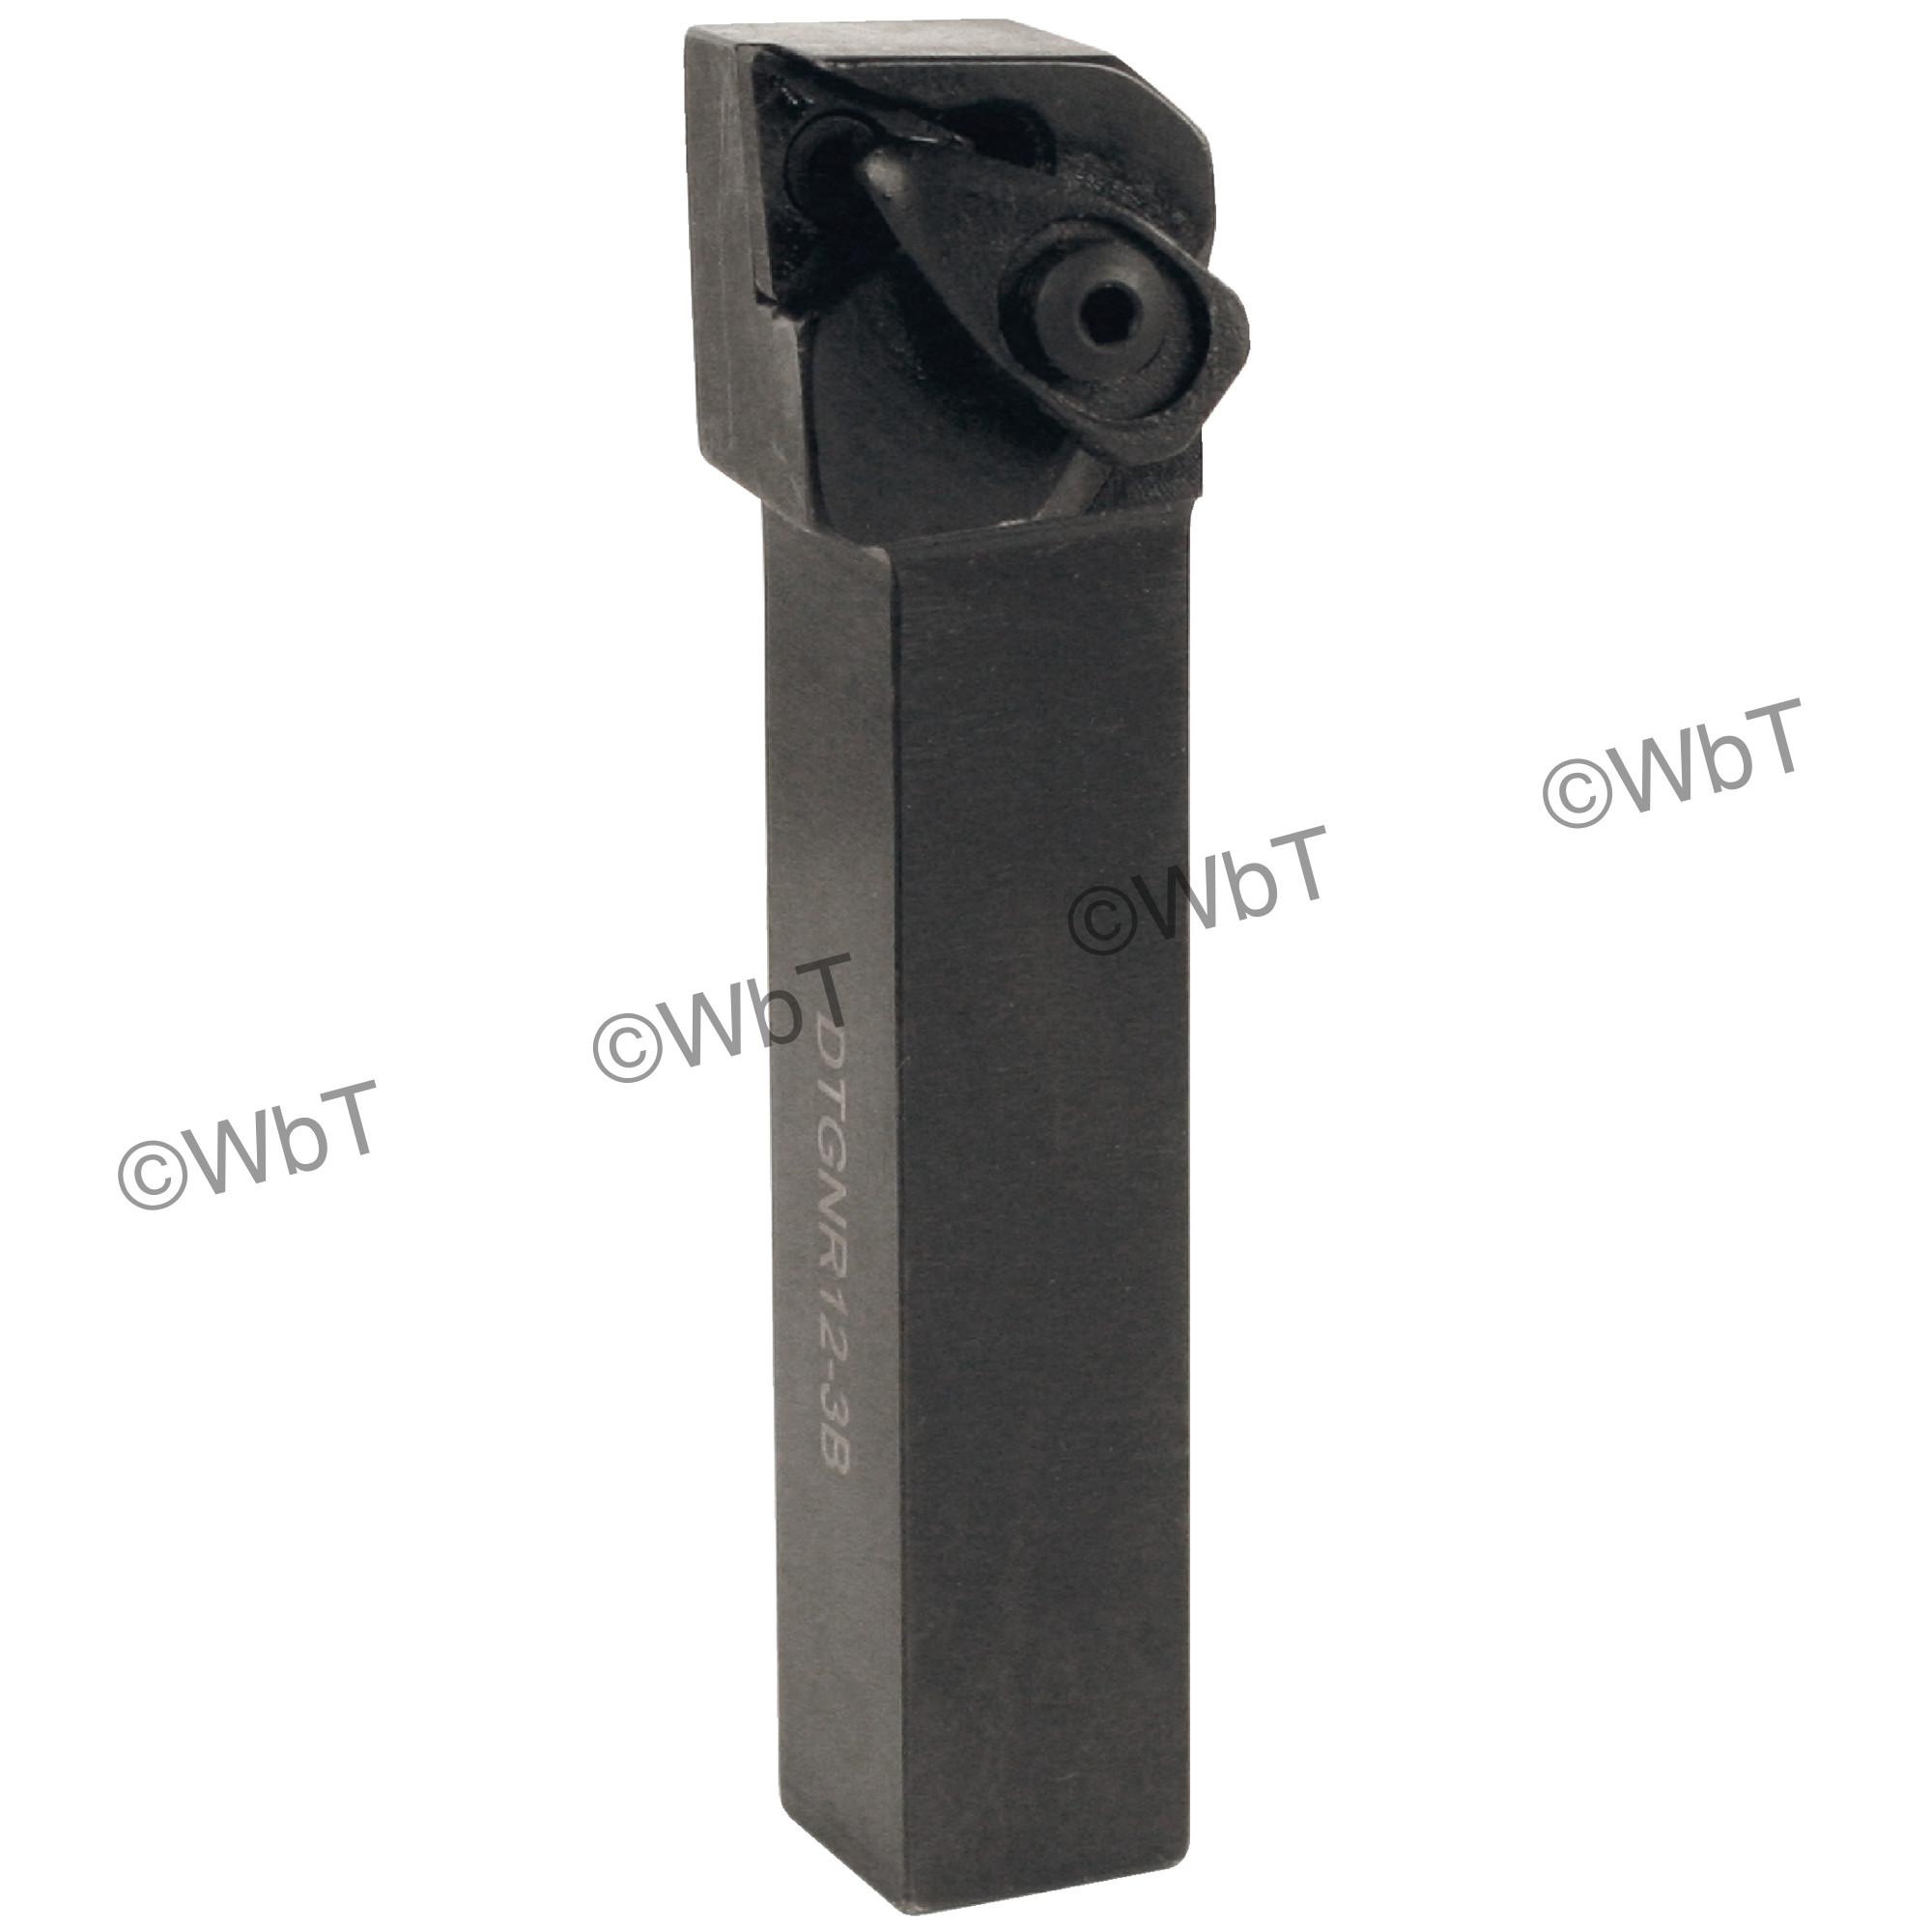 "TTC PRODUCTION - DTGNR12-3B / 0.750"" External Tool Holder for TNMG33_ Inserts / Right Hand"